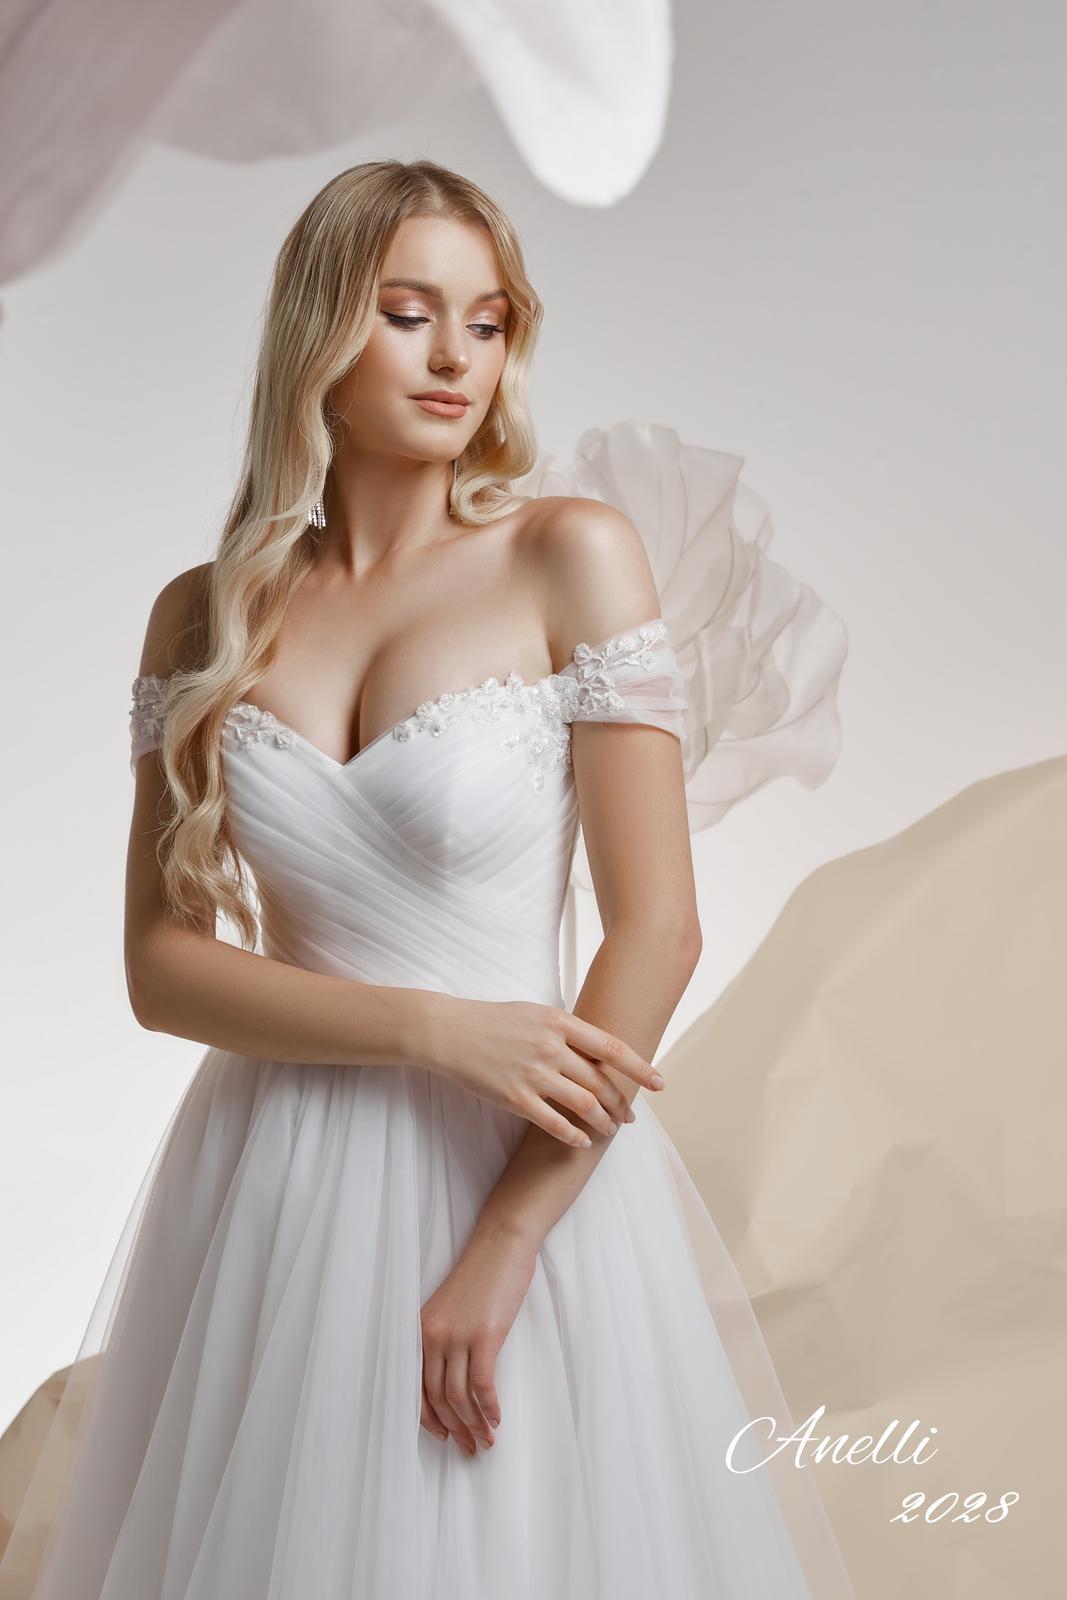 Svadobné šaty - Imagine 2028 - Obrázok č. 3